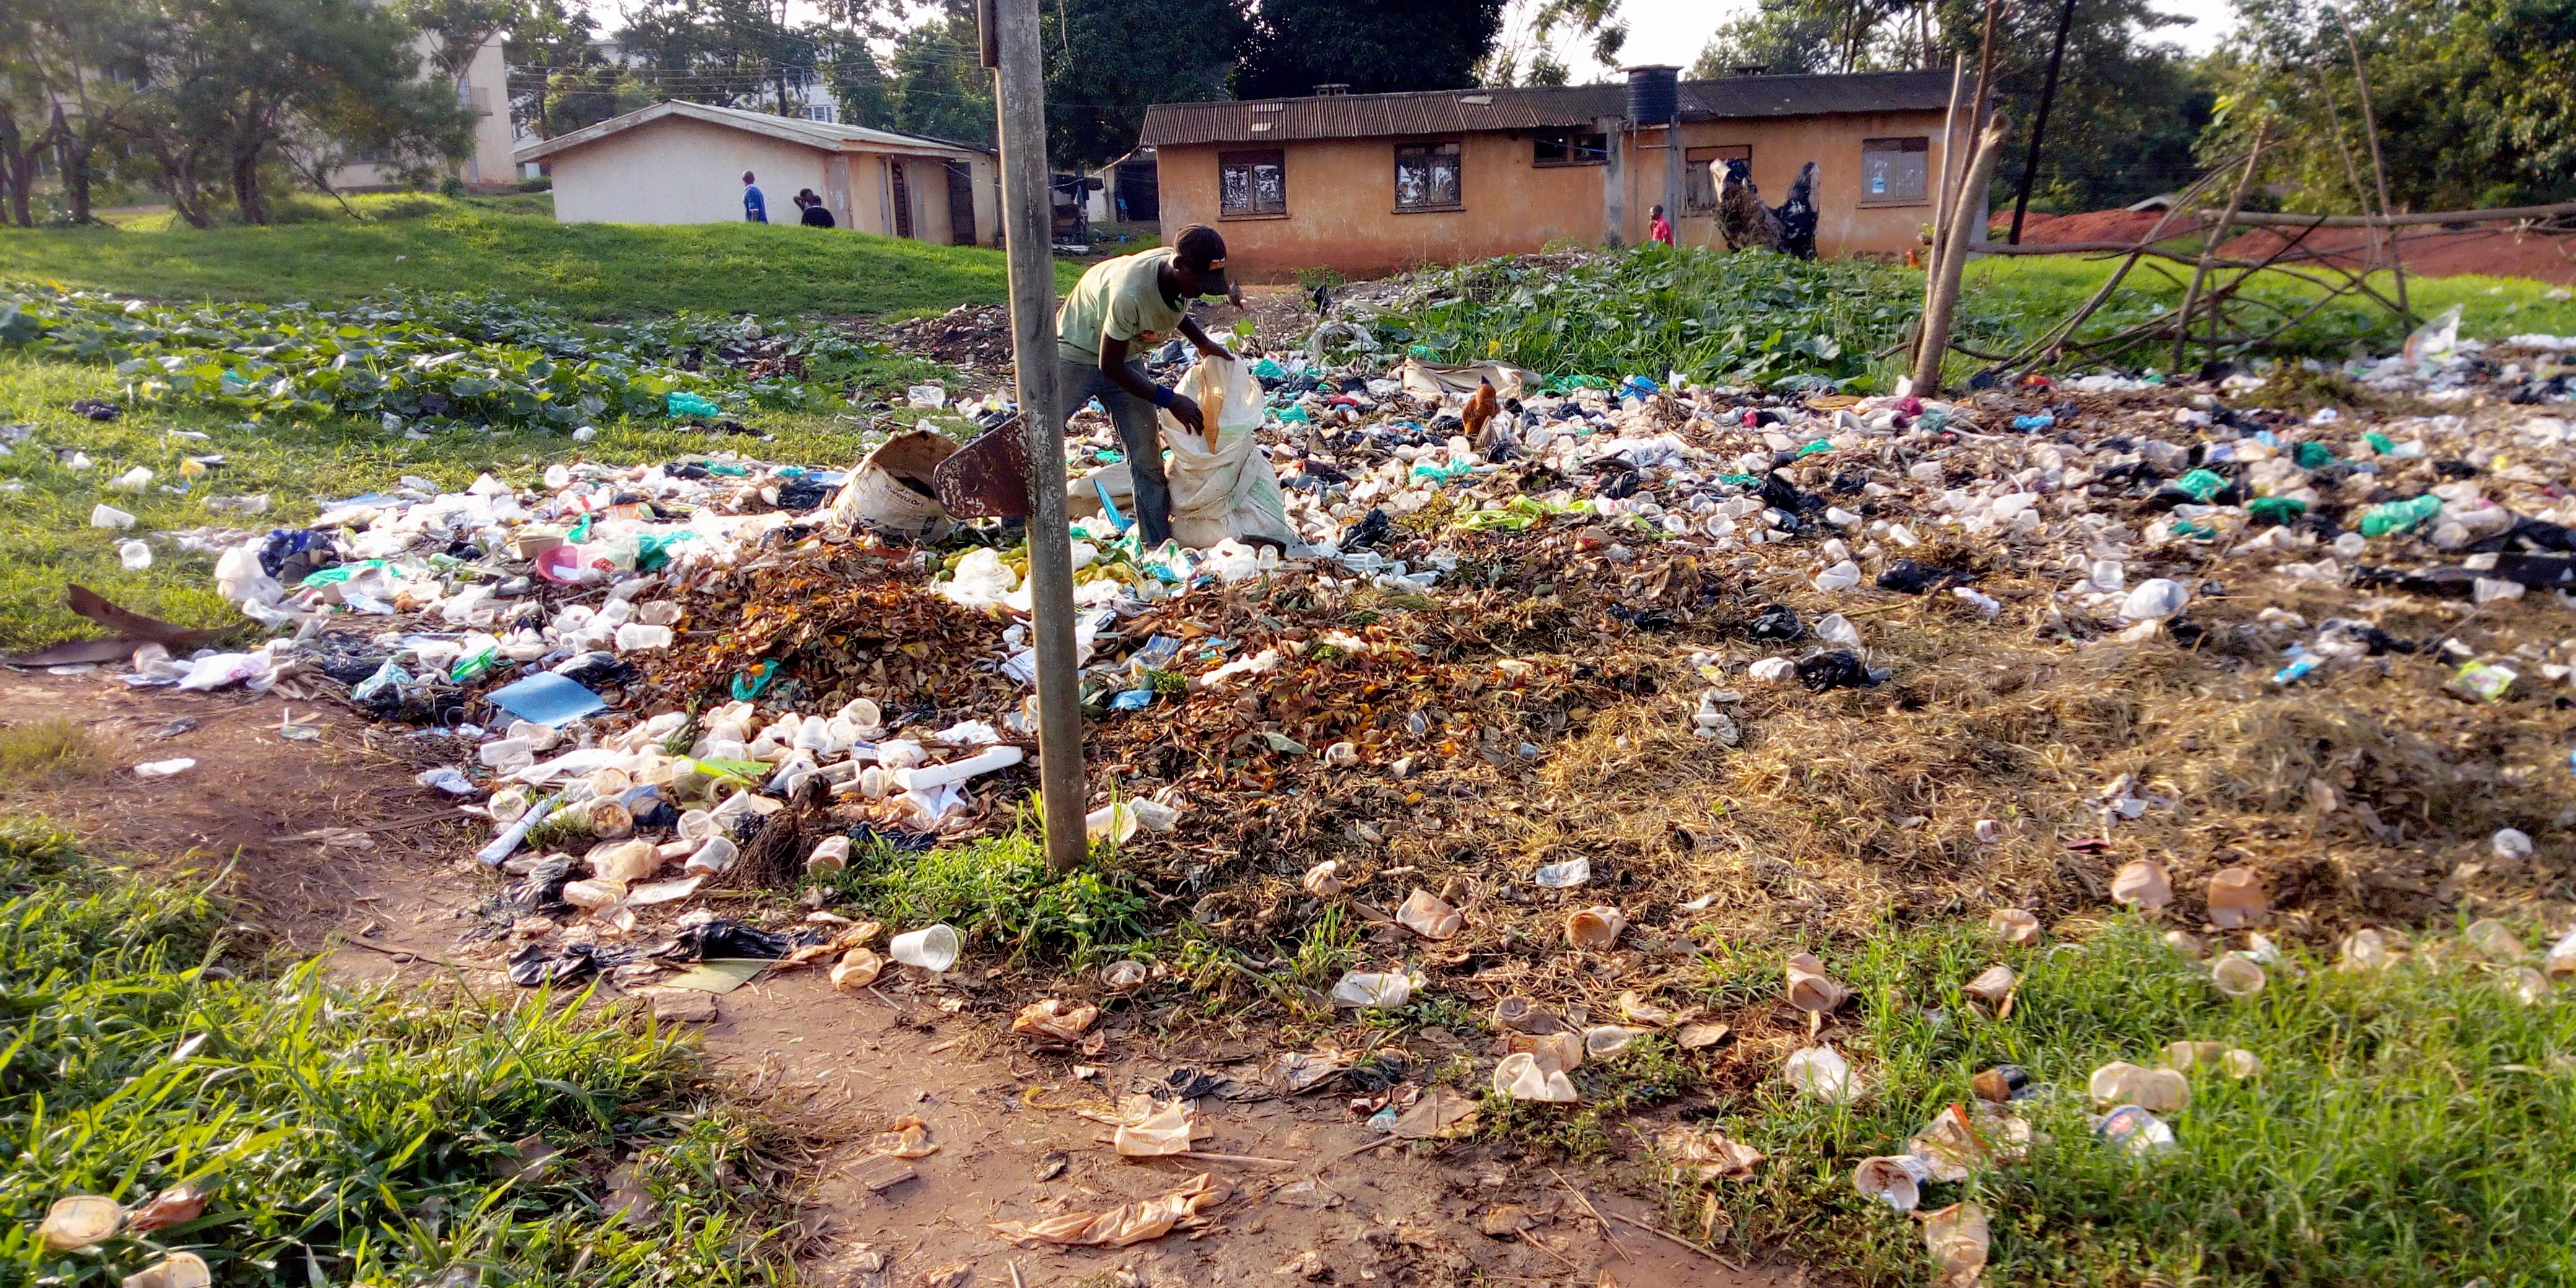 2019-06-20-uganda-waste-collection.jpg